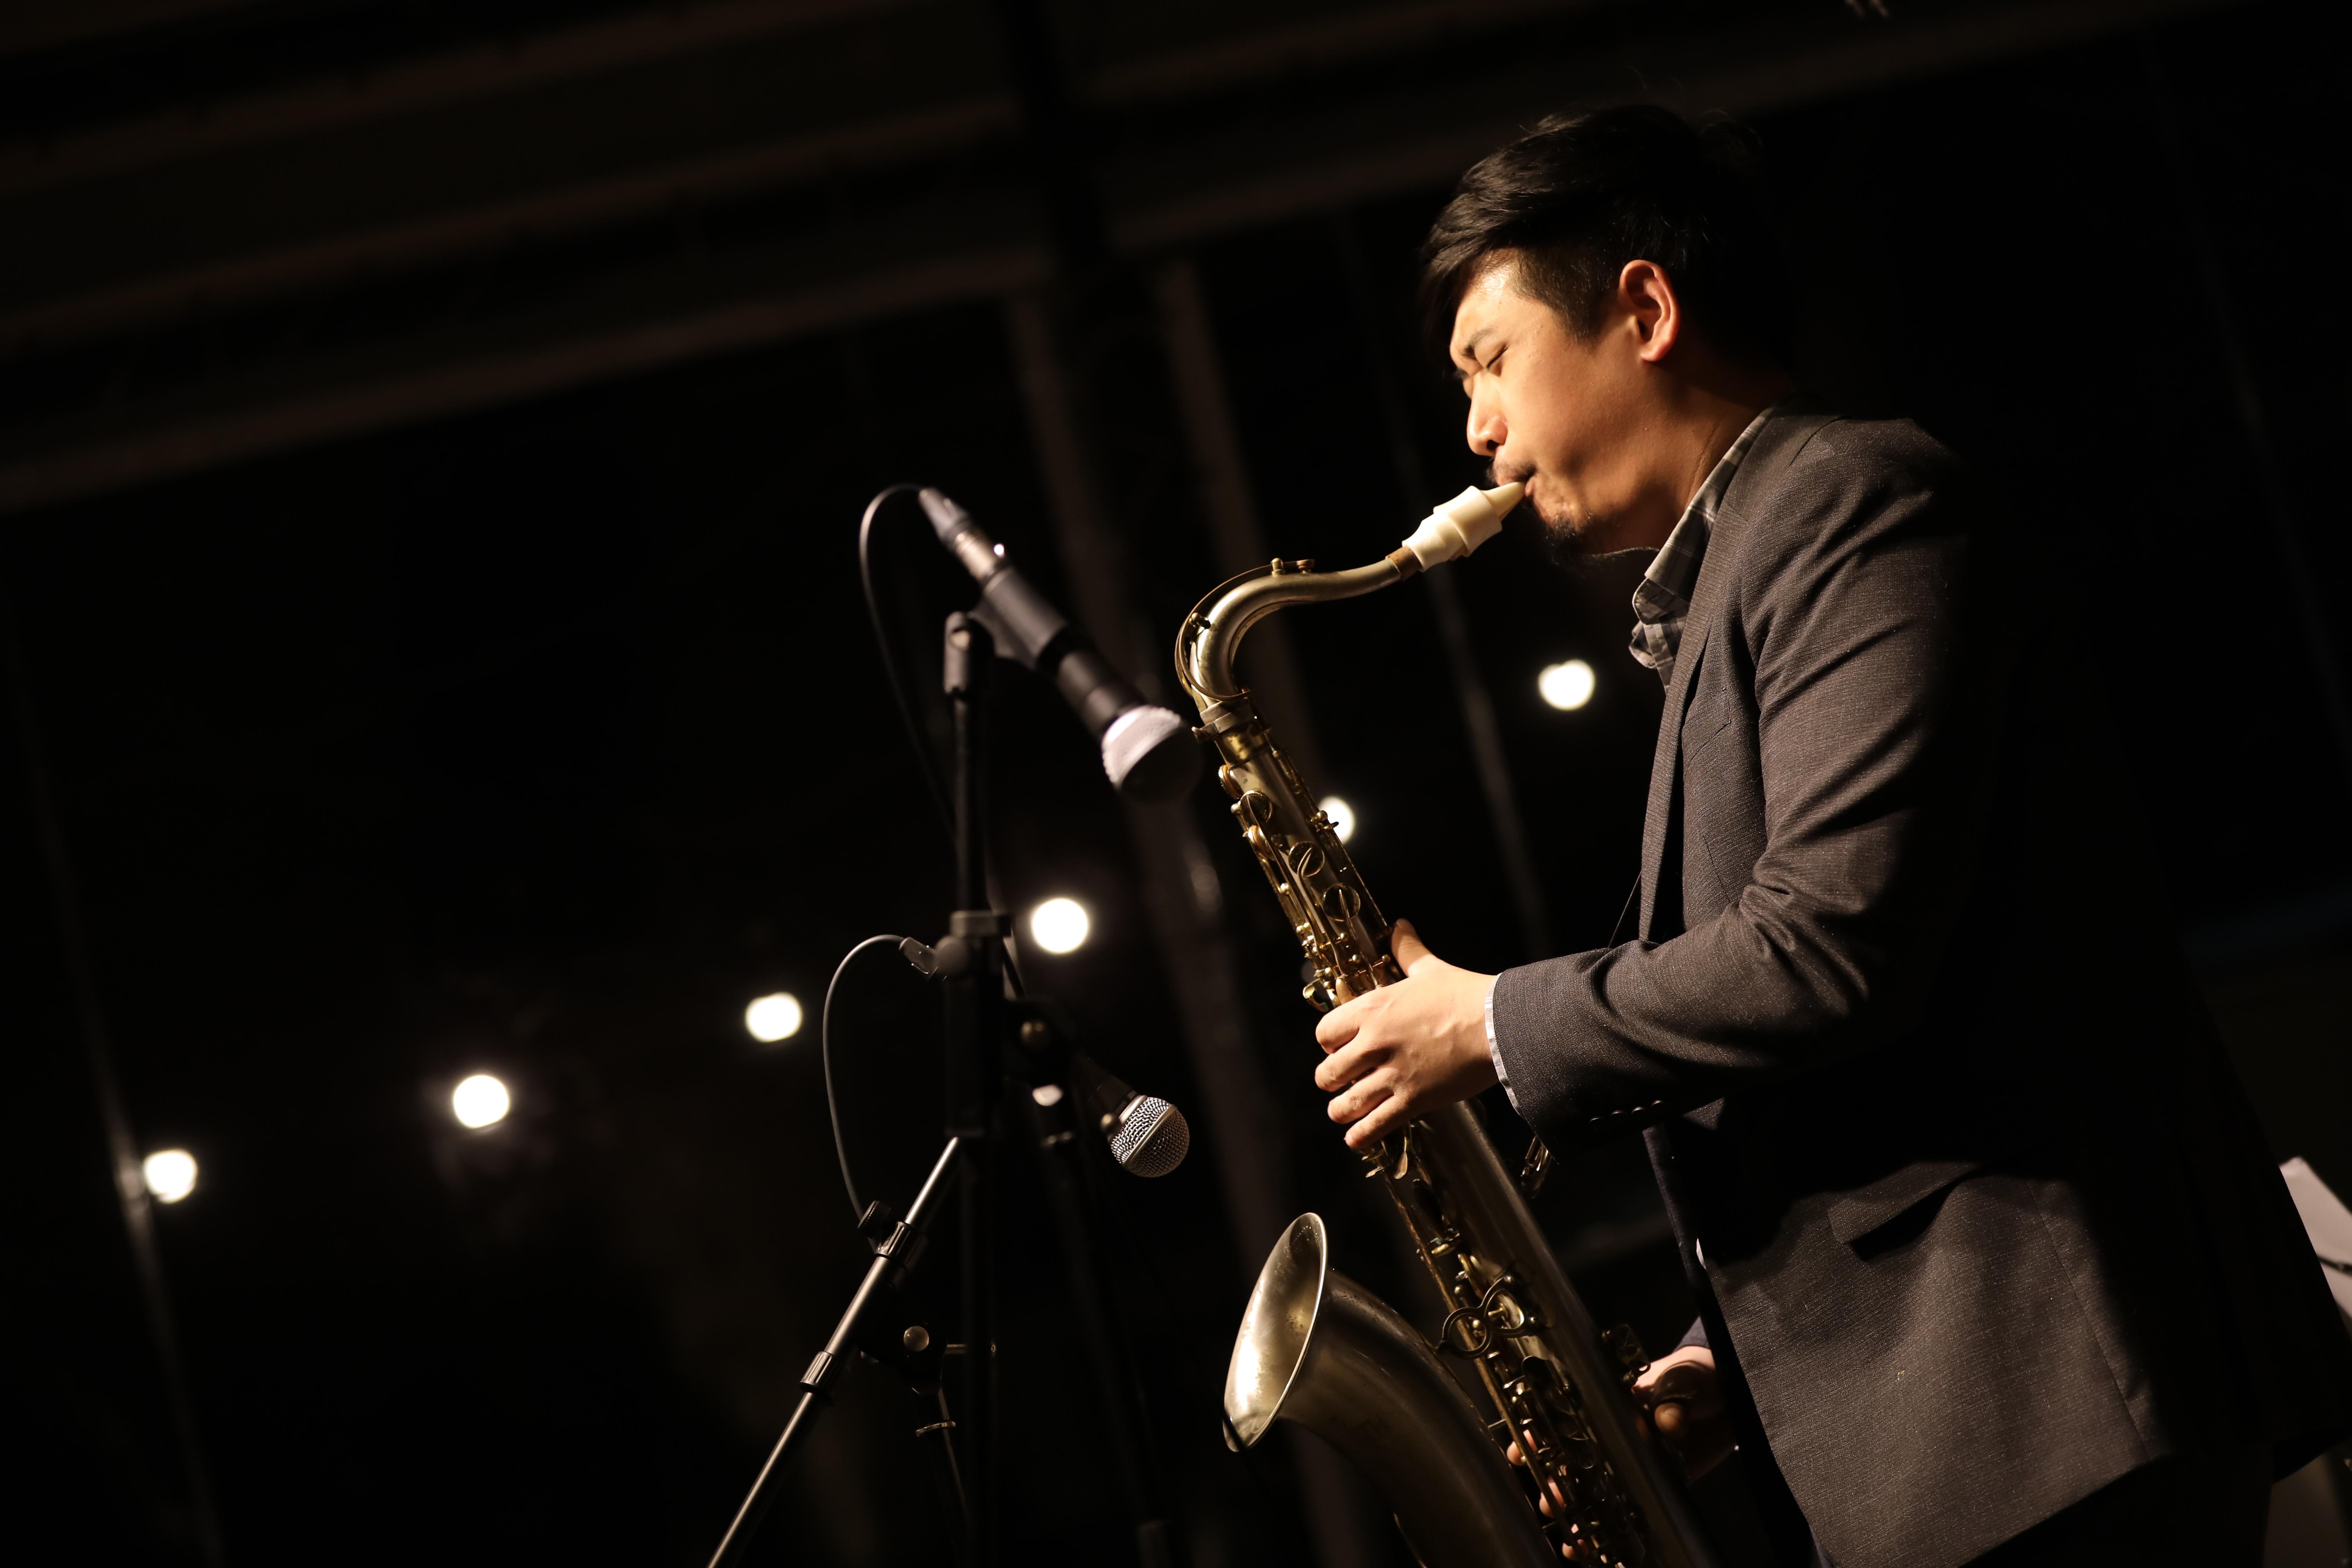 Daniel Ko plays a Syos saxophone mouthpiece